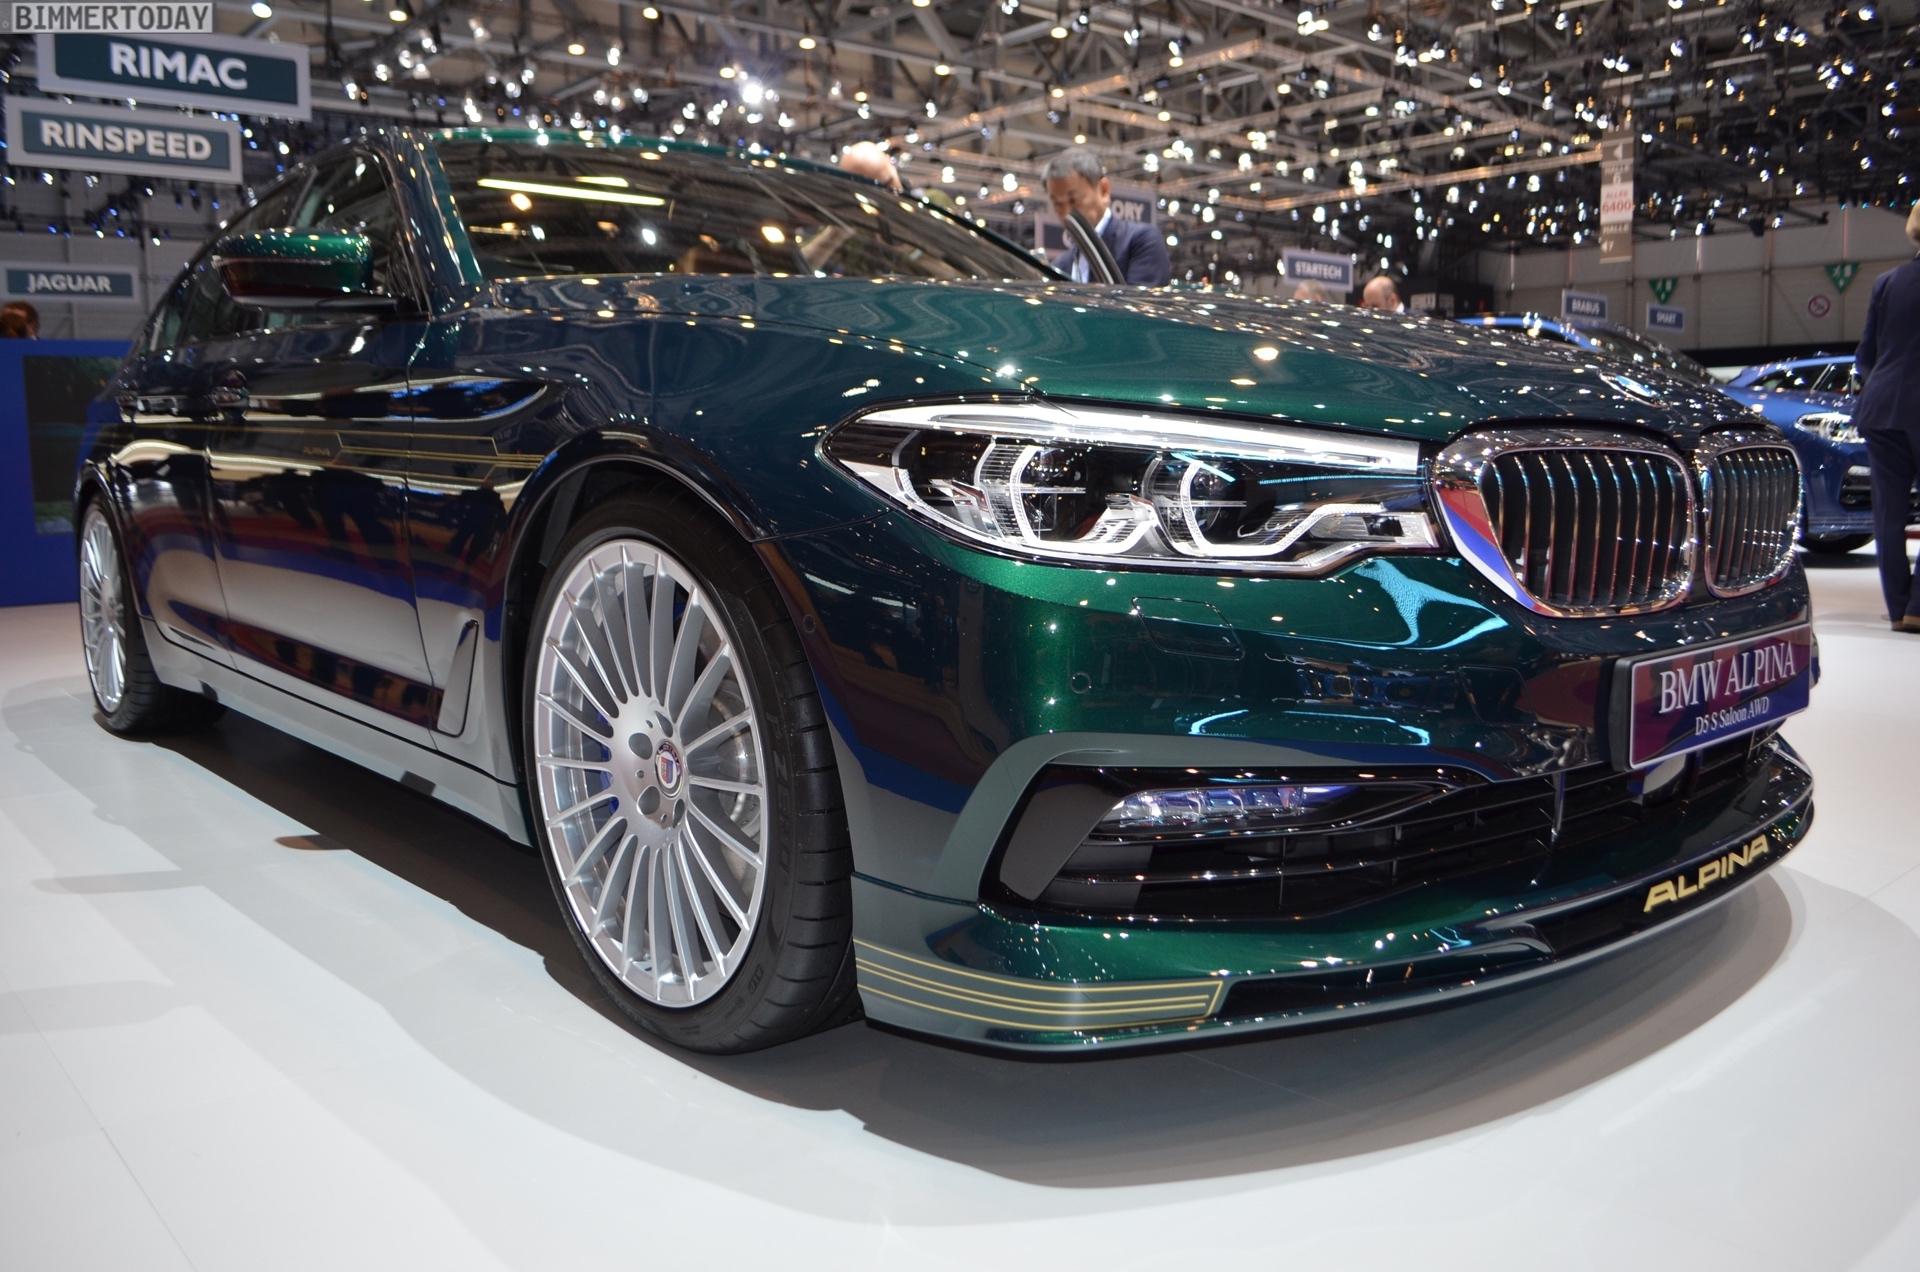 Genf 2018 Alpina D5 S BMW 5er G30 Live 03